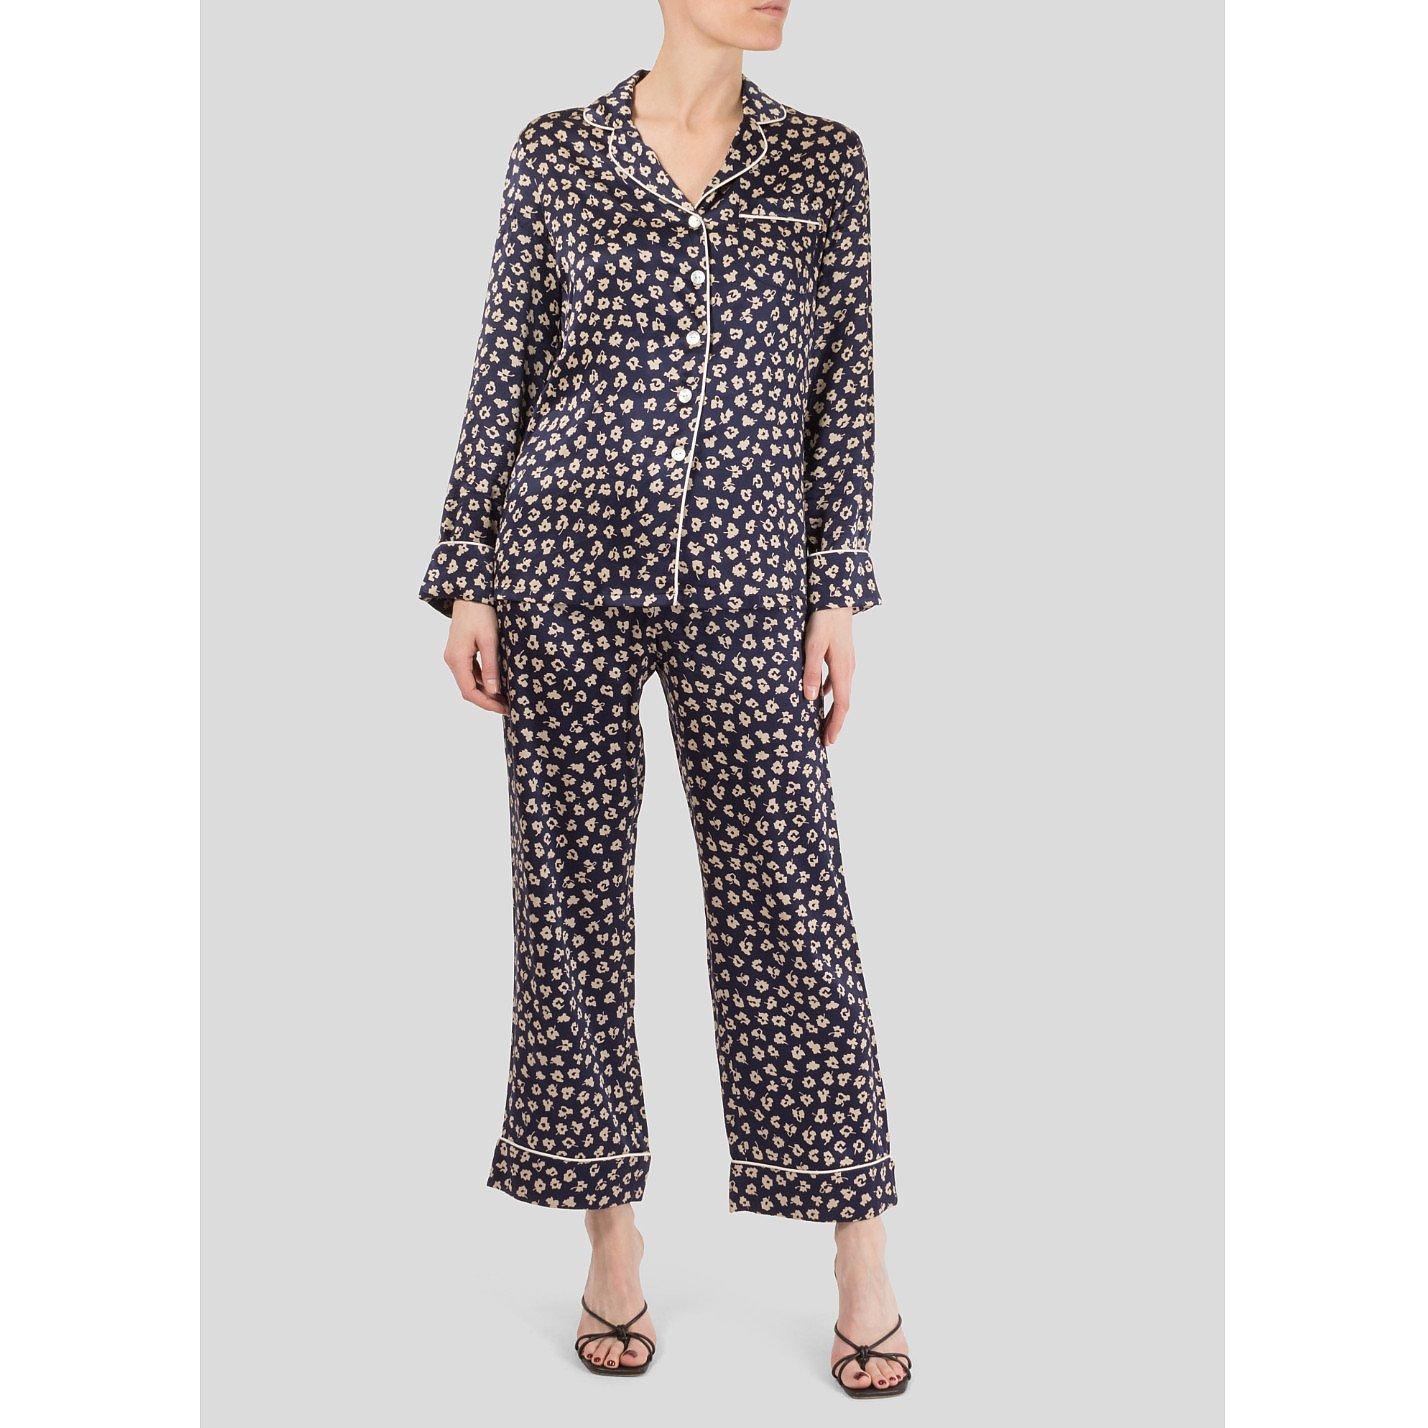 Olivia von Halle Silk Satin Pyjama Set